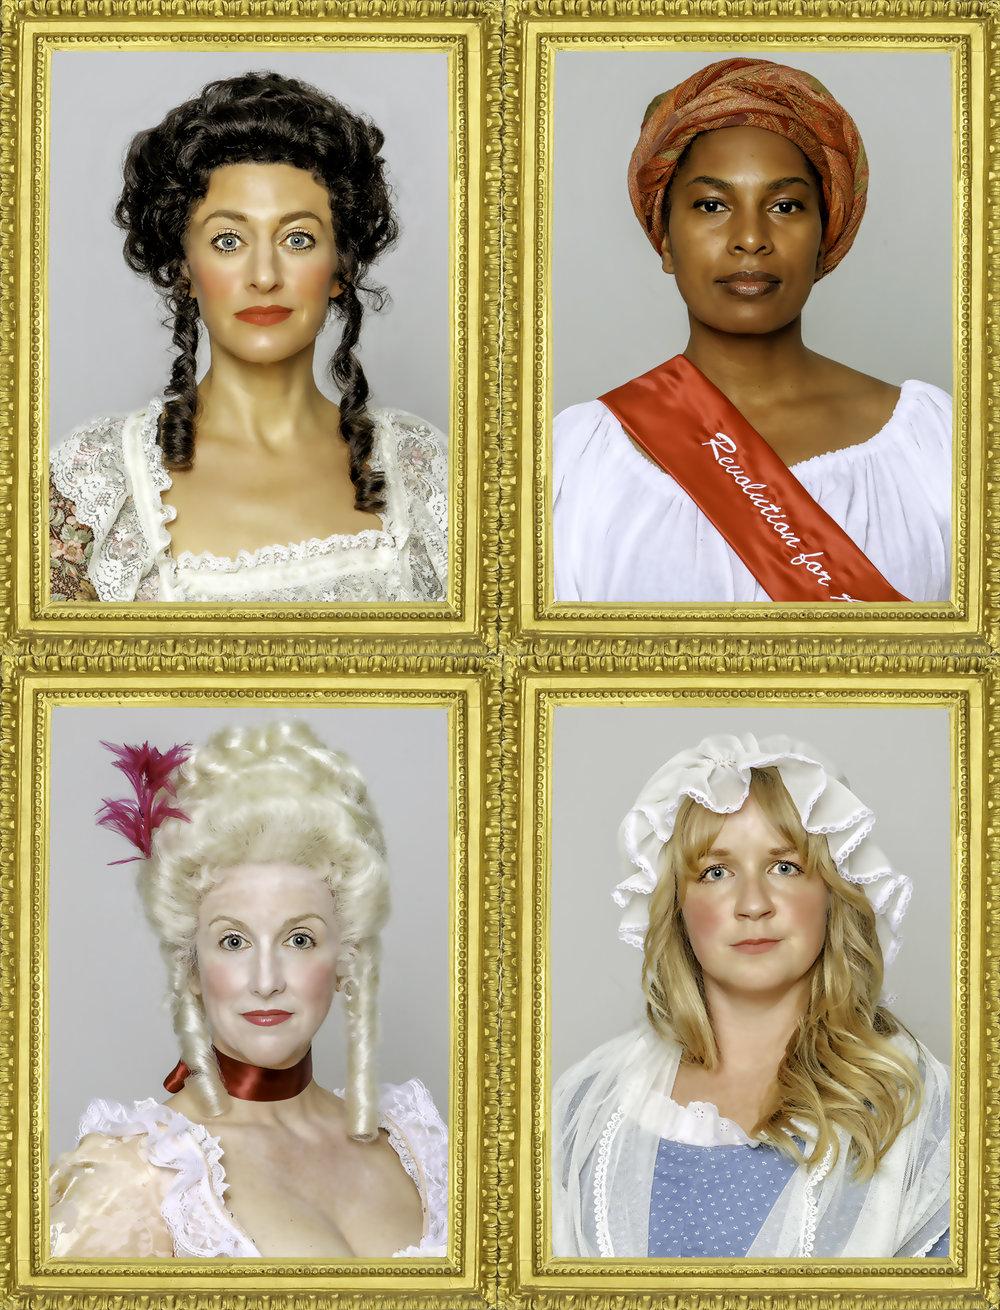 PHOTO BY STU SELLAND; pictured (clockwise, from top left): Sarah Mitchell, Kimberly Ridgeway, Heather Kellogg, Suzie Shepard